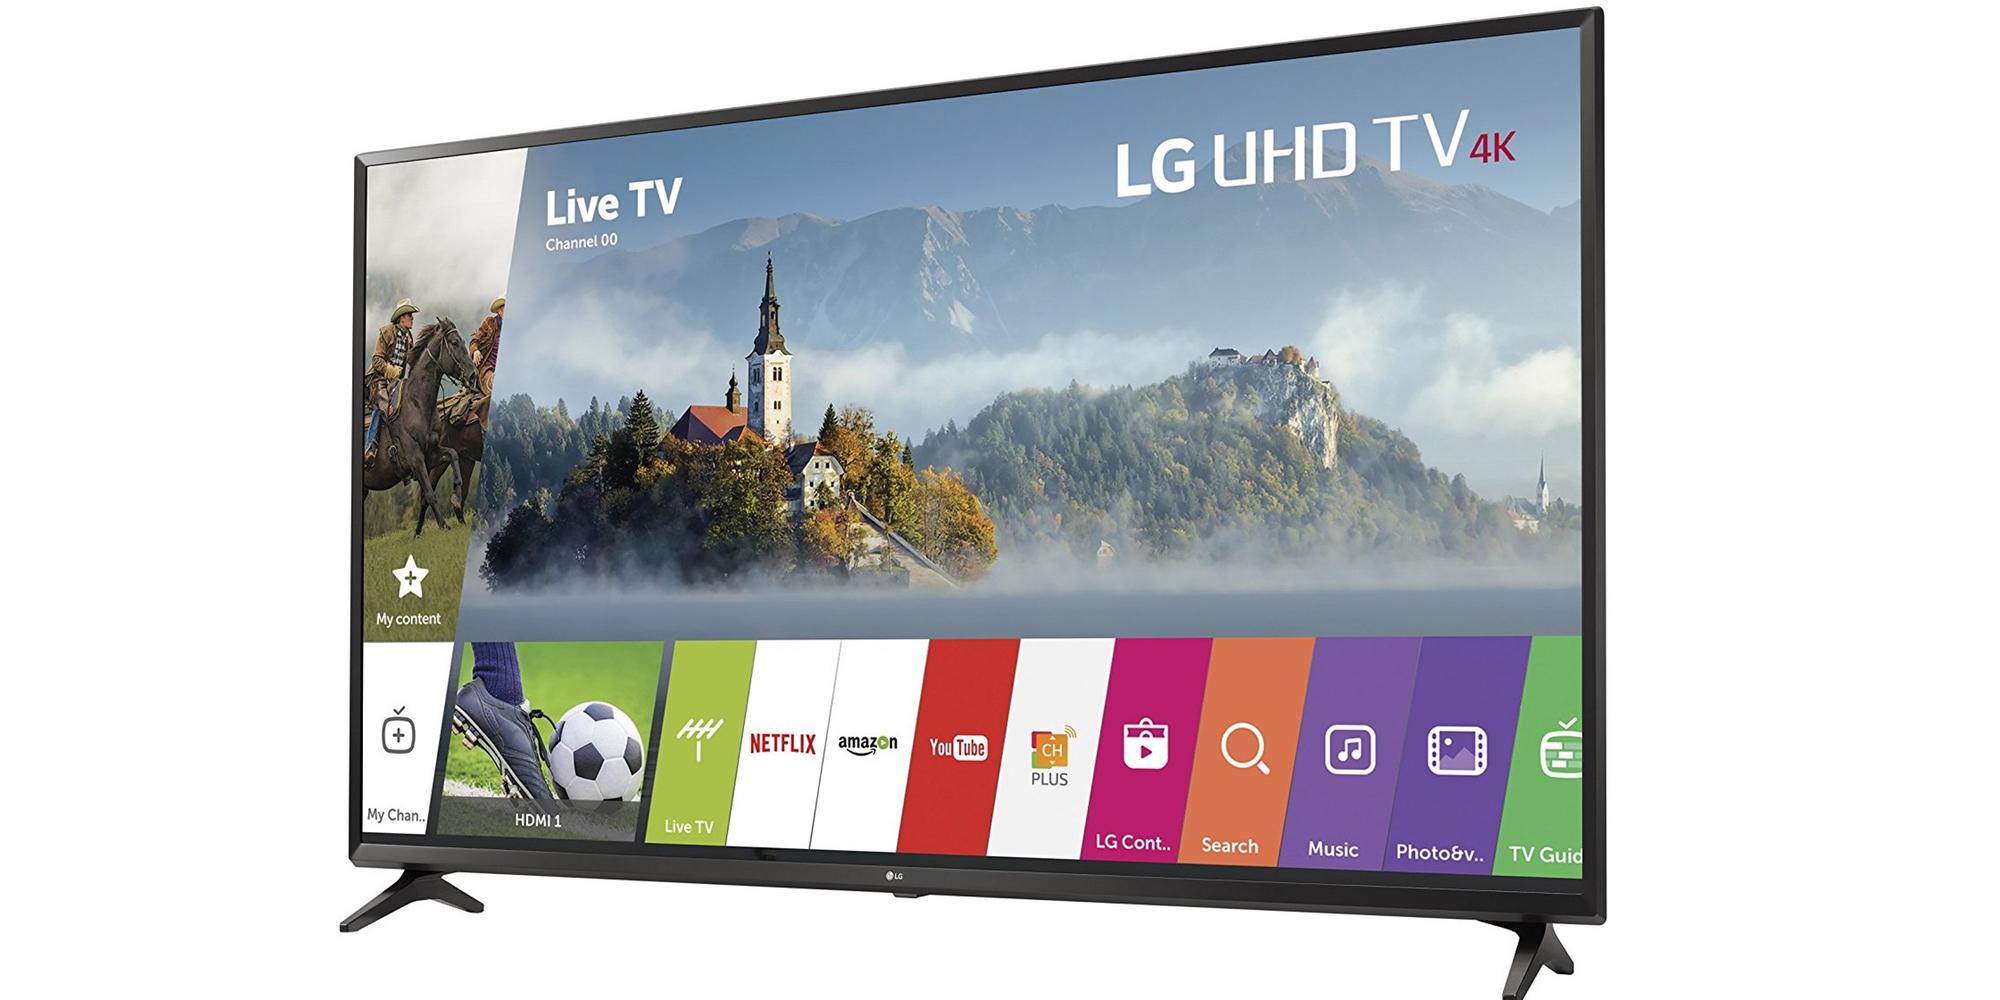 Best Of Black Friday 2017 4k Ultra Hdtvs Sharp 50 Inch Smart Tv